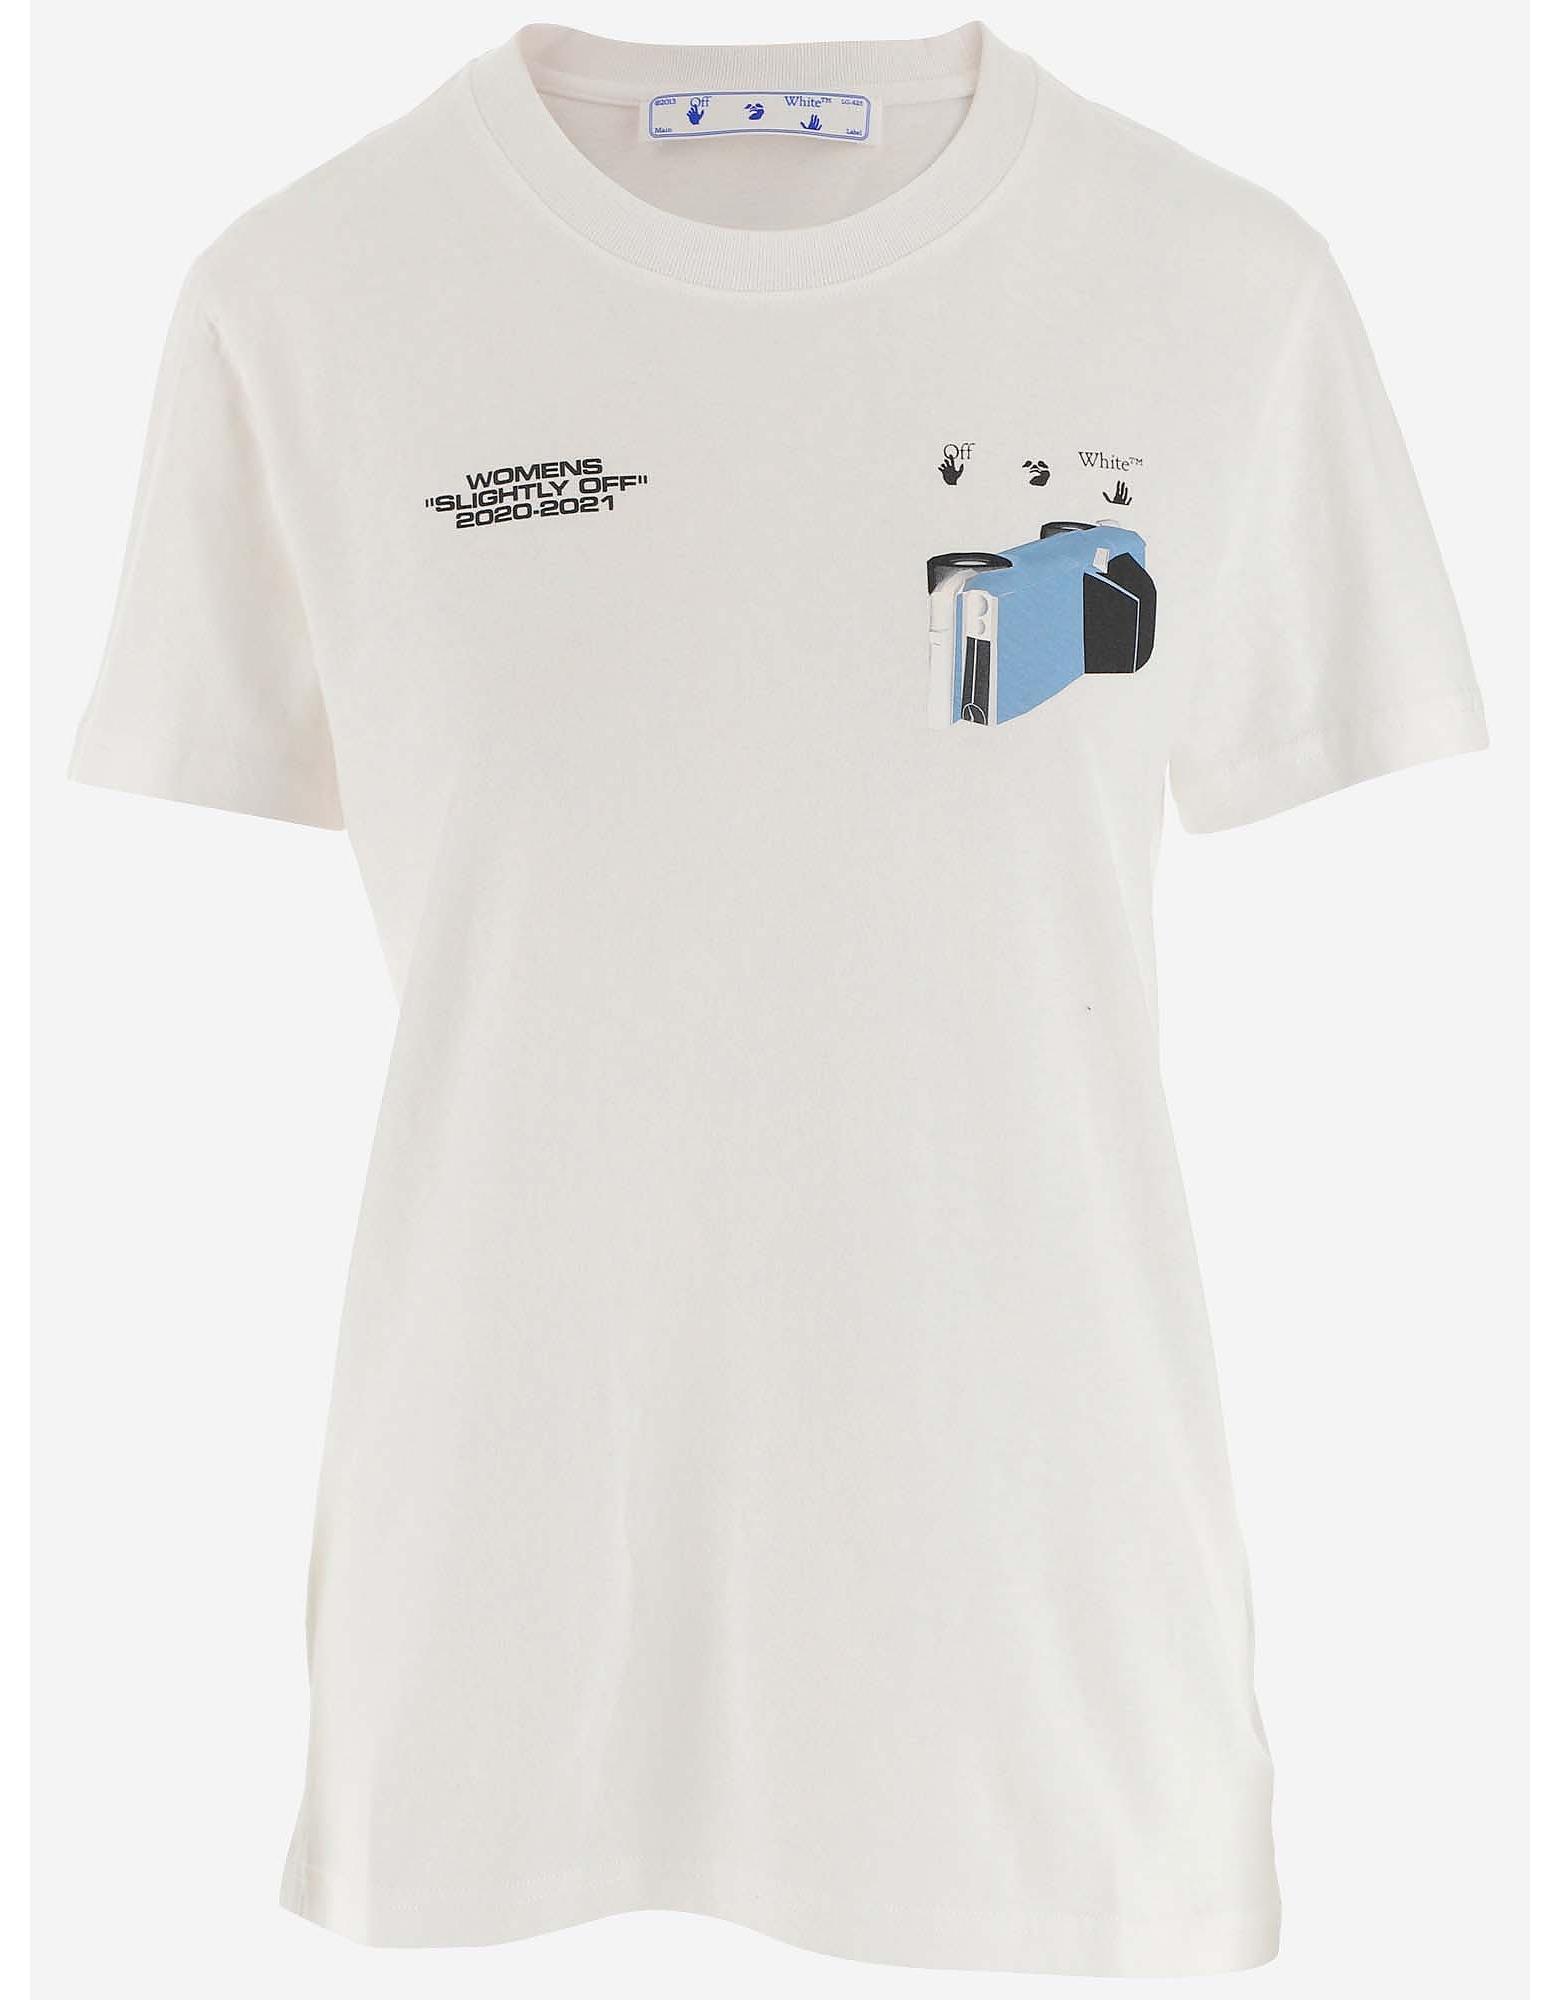 Off-White Designer T-Shirts & Tops, Women's T-Shirt